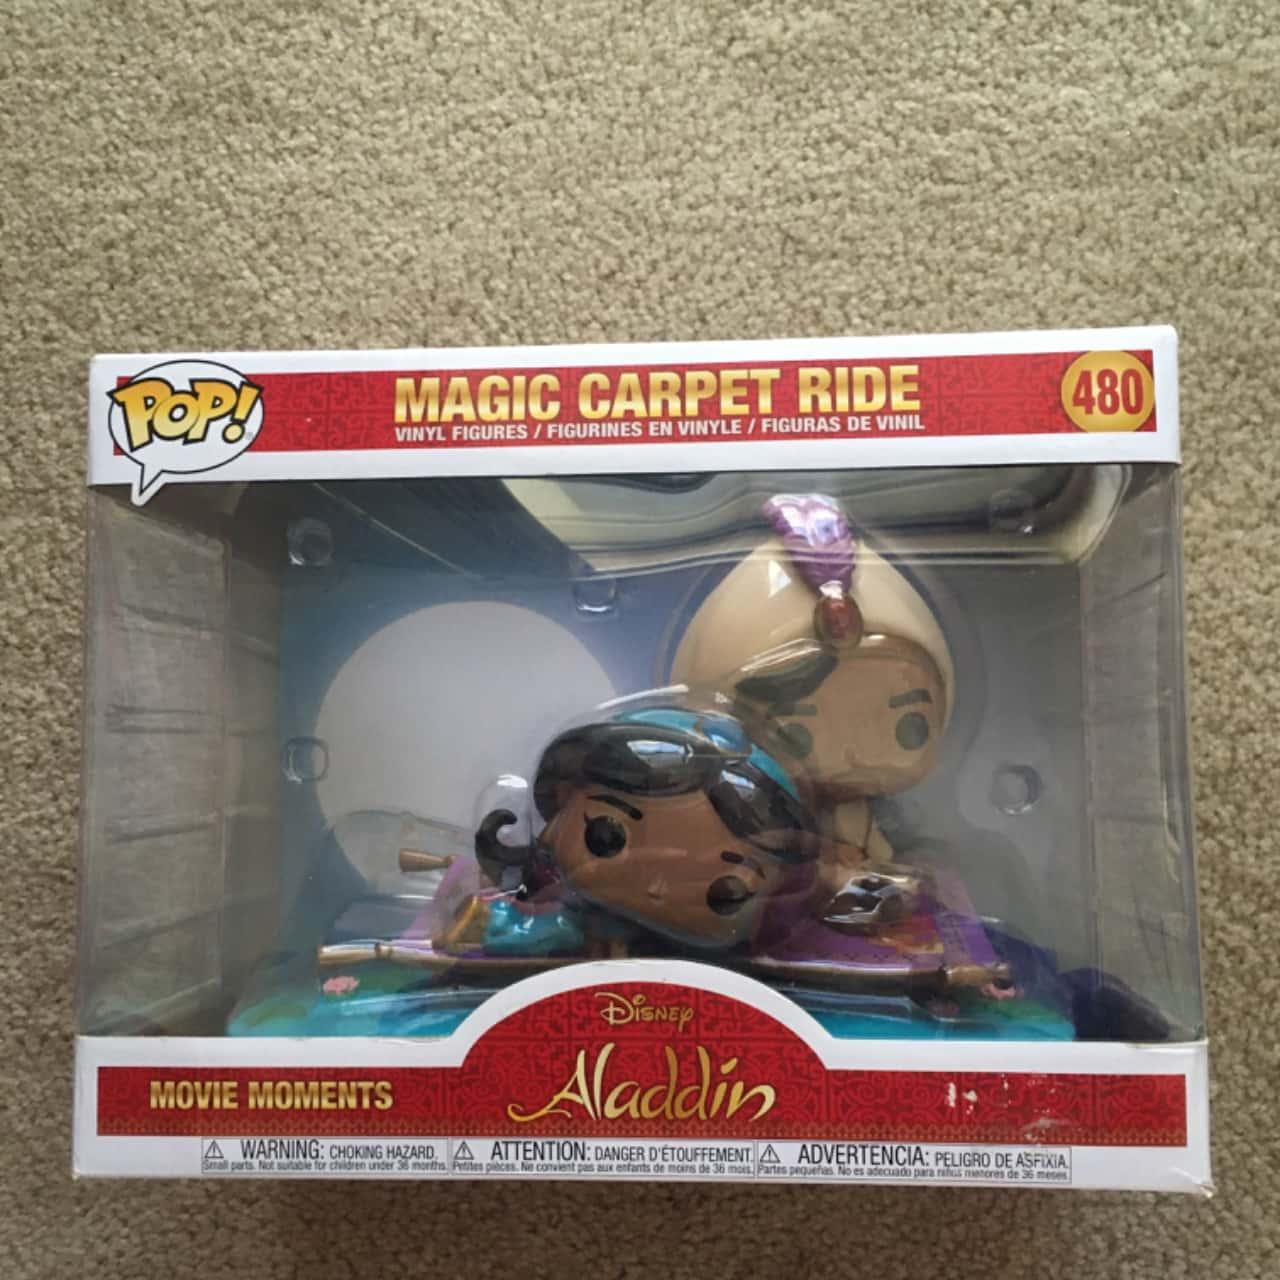 Disney Aladdin Magic Carpet Ride Movie Moments Pop! Figurines, Brand New